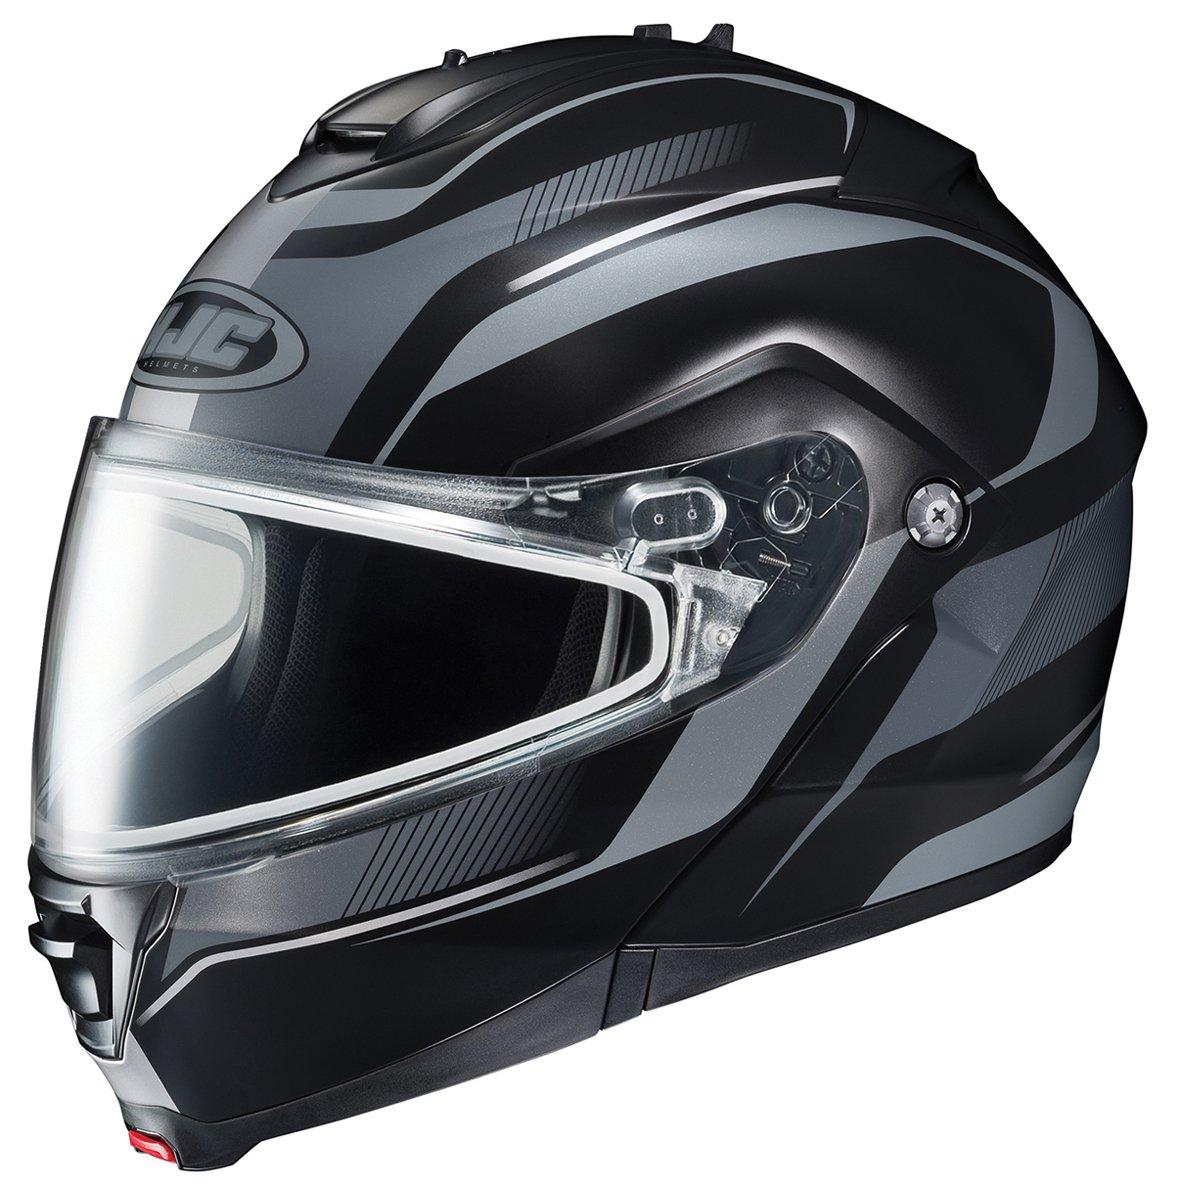 HJC IS-MAX2SN Style Modular Snow Helmet Frameless Dual Lens Shield (MC-5F Black/Silver, XX-Large)